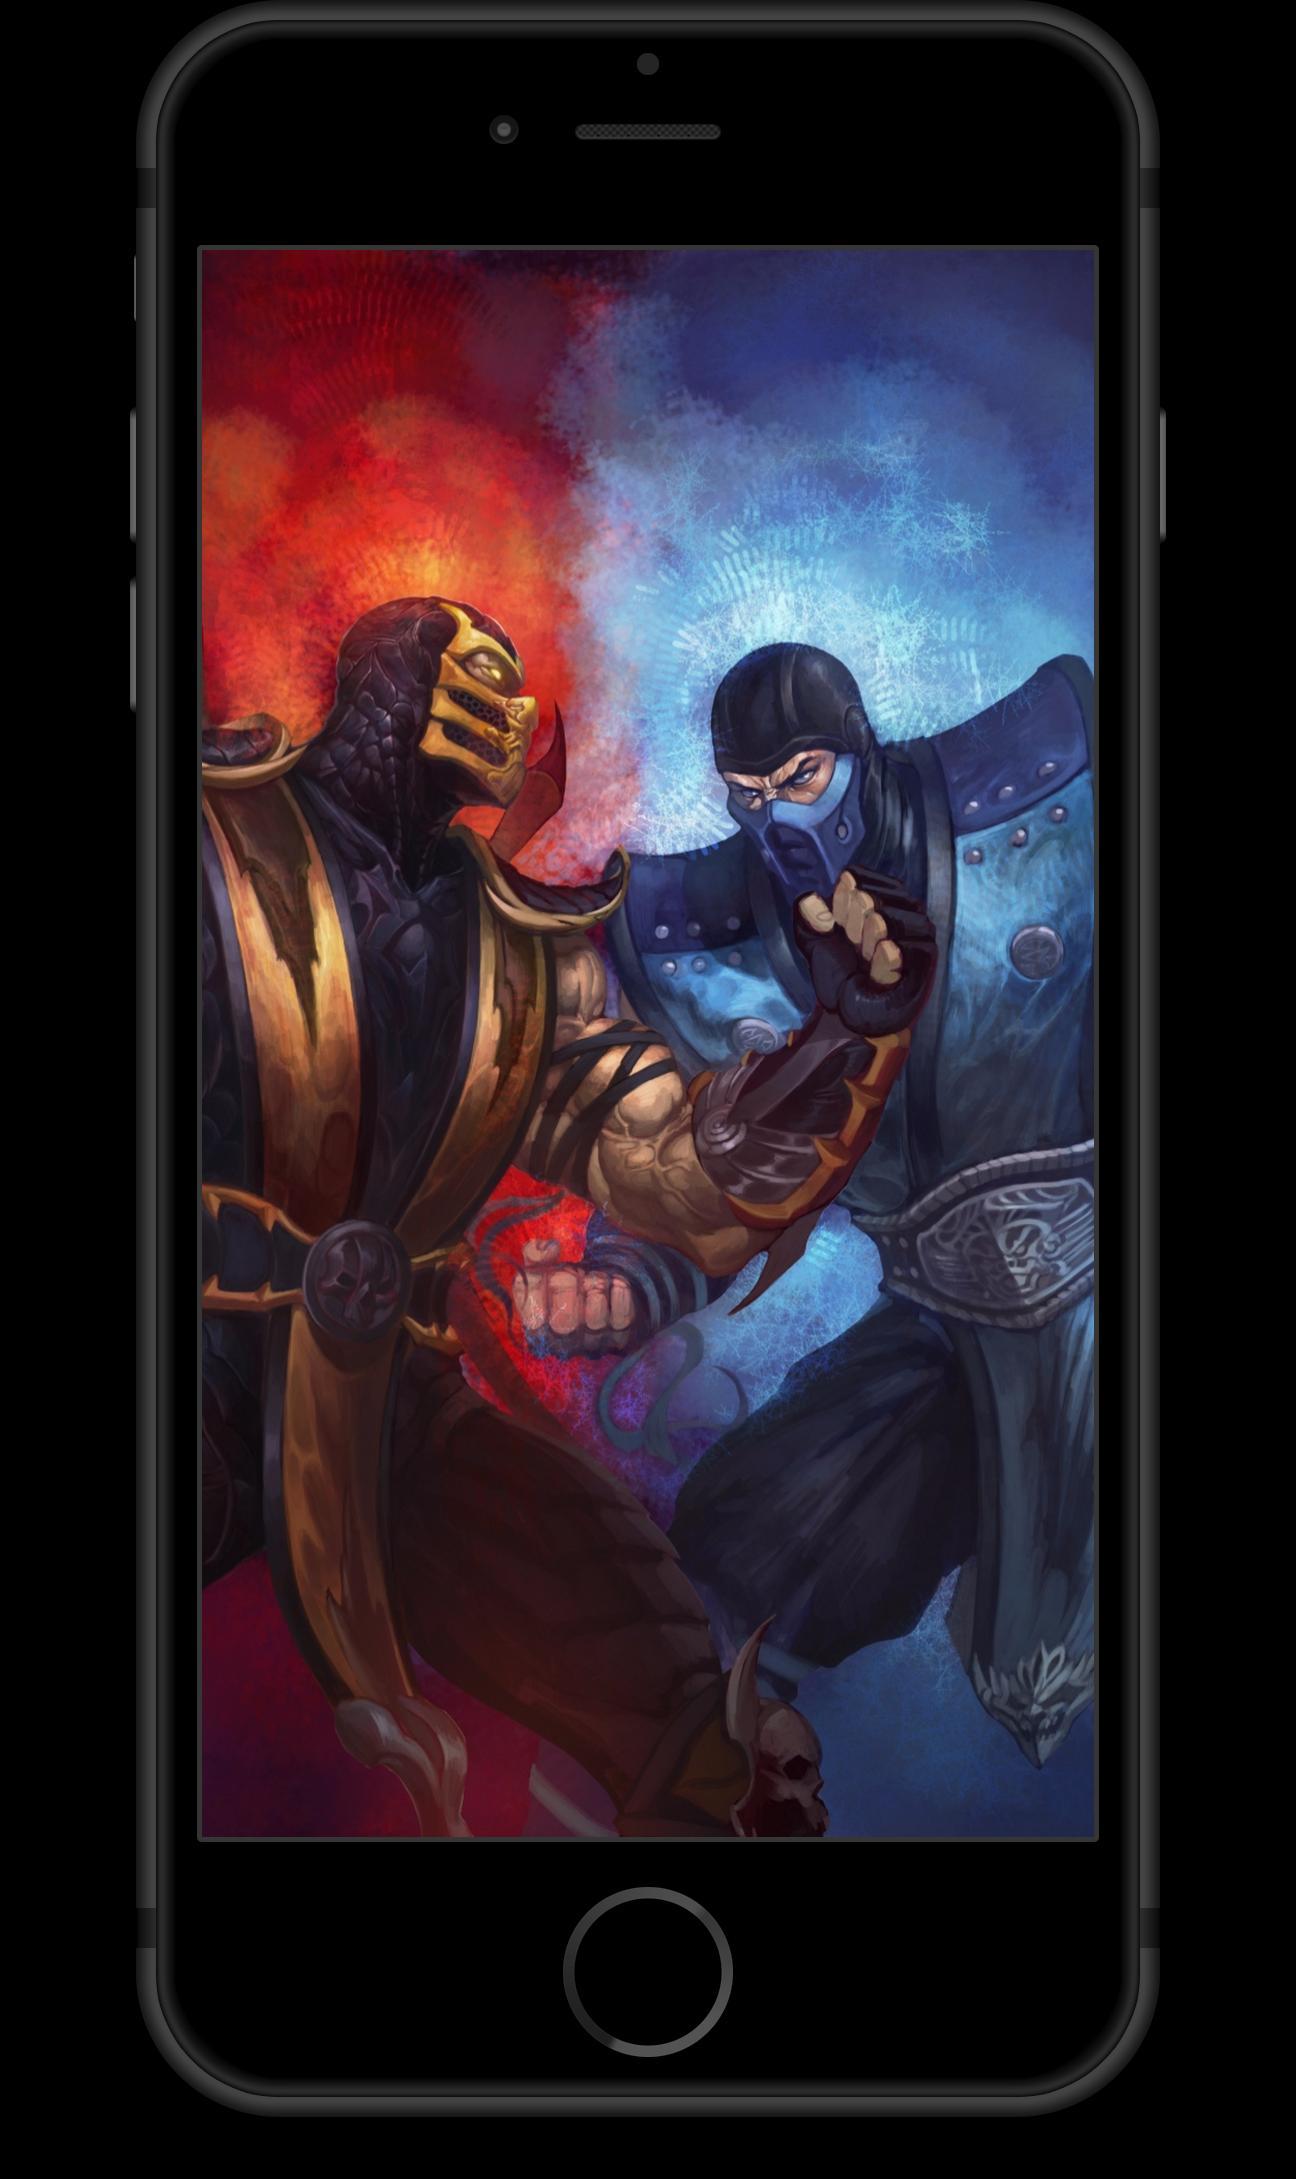 Mortal Kombat Wallpapers Hd Für Android Apk Herunterladen